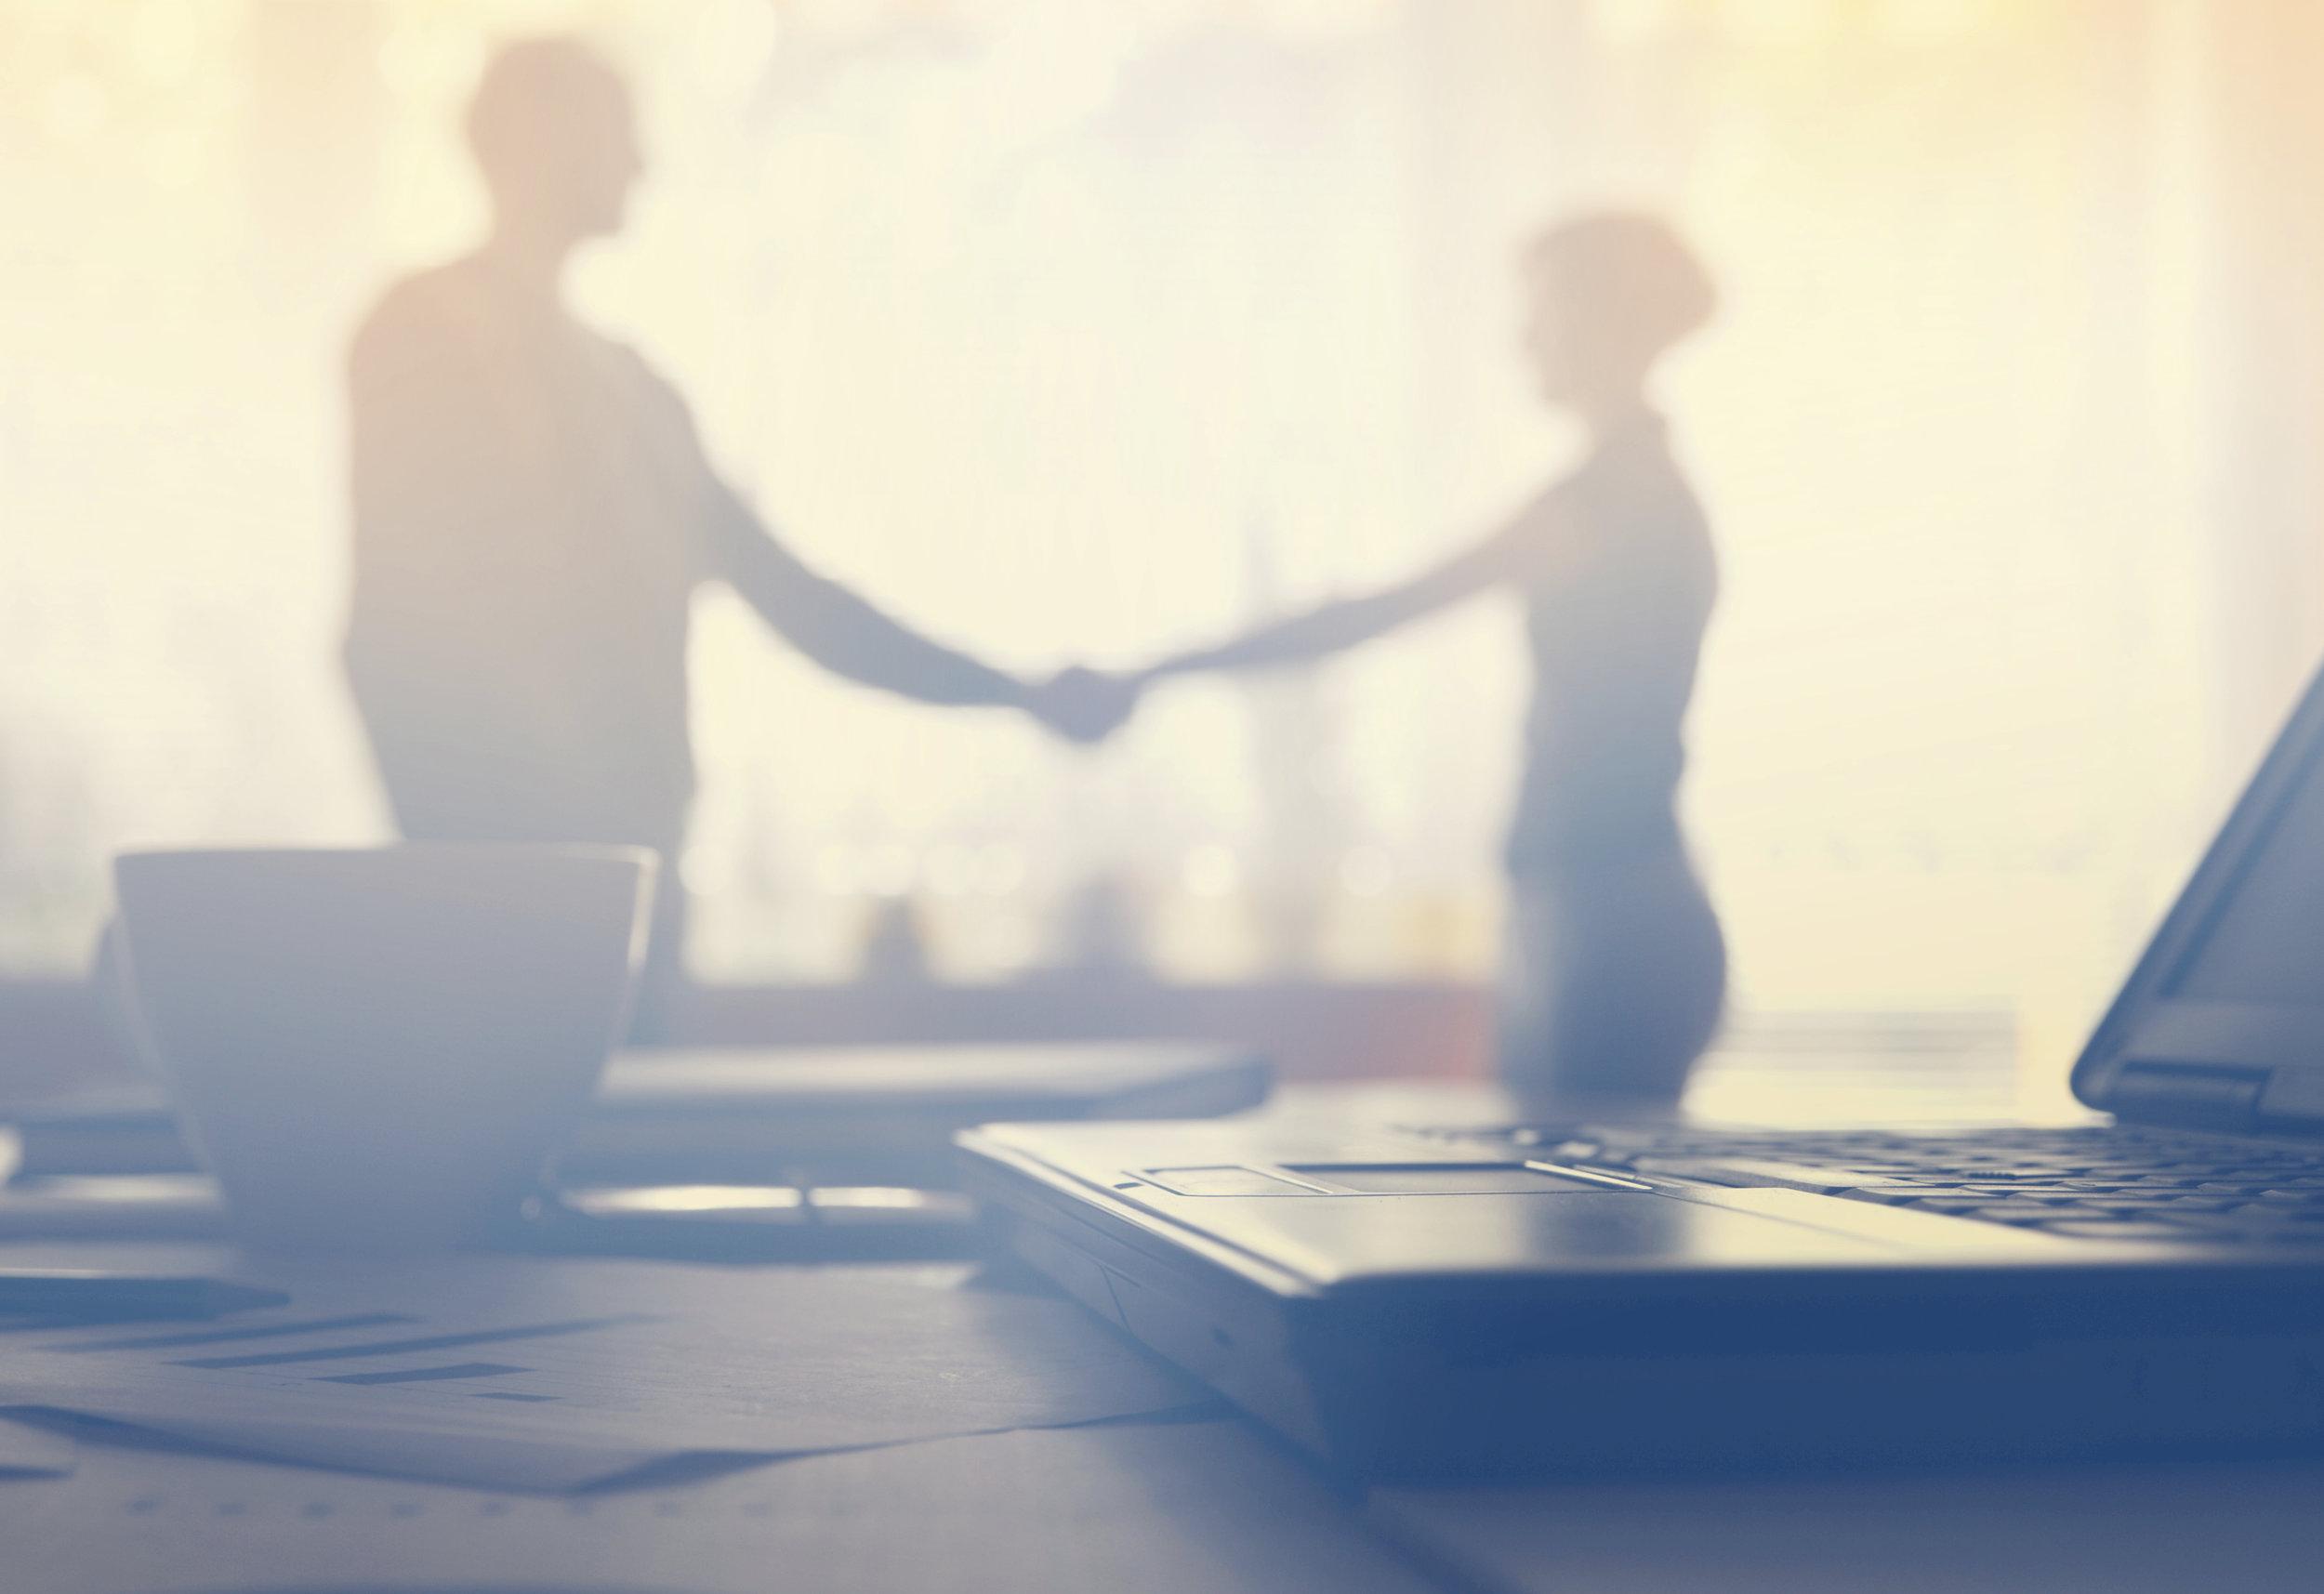 Picking a business partner